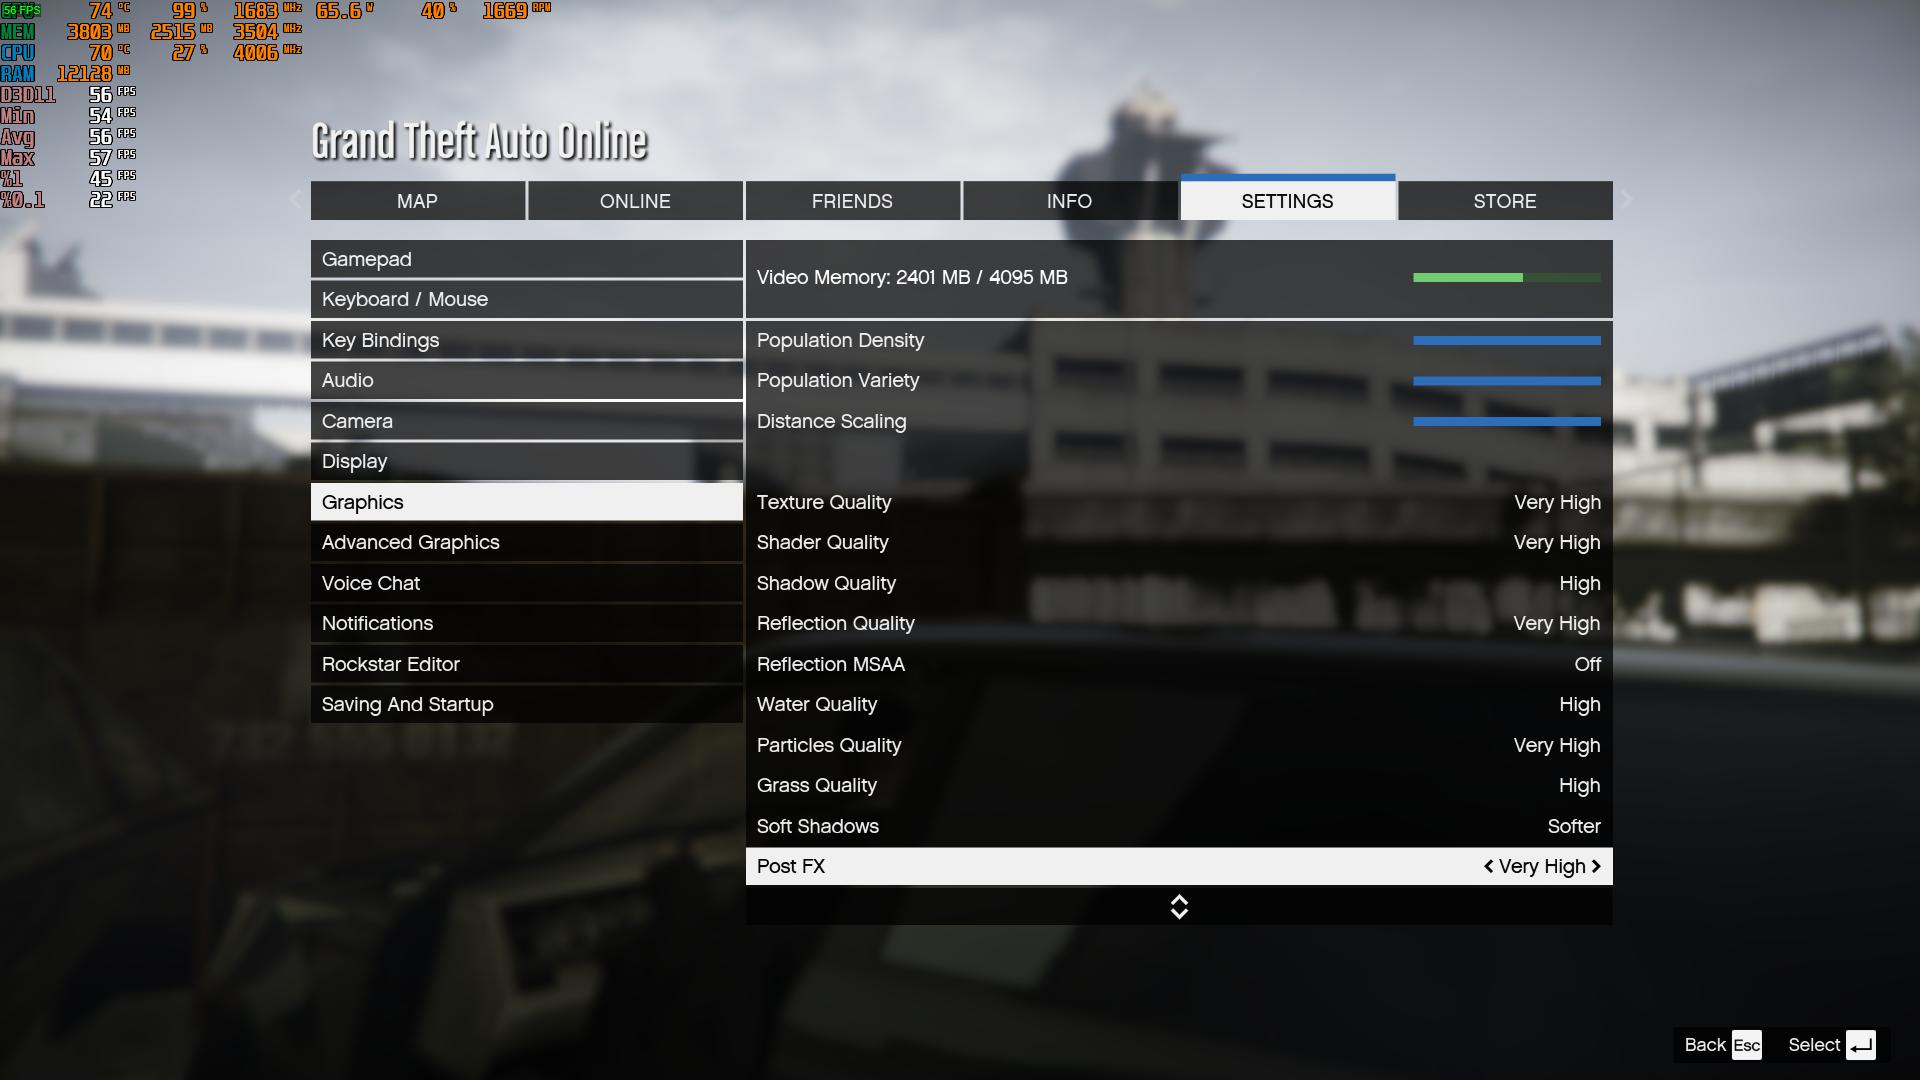 Grand Theft Auto V Screenshot 2021.05.06 - 14.29.40.08.png